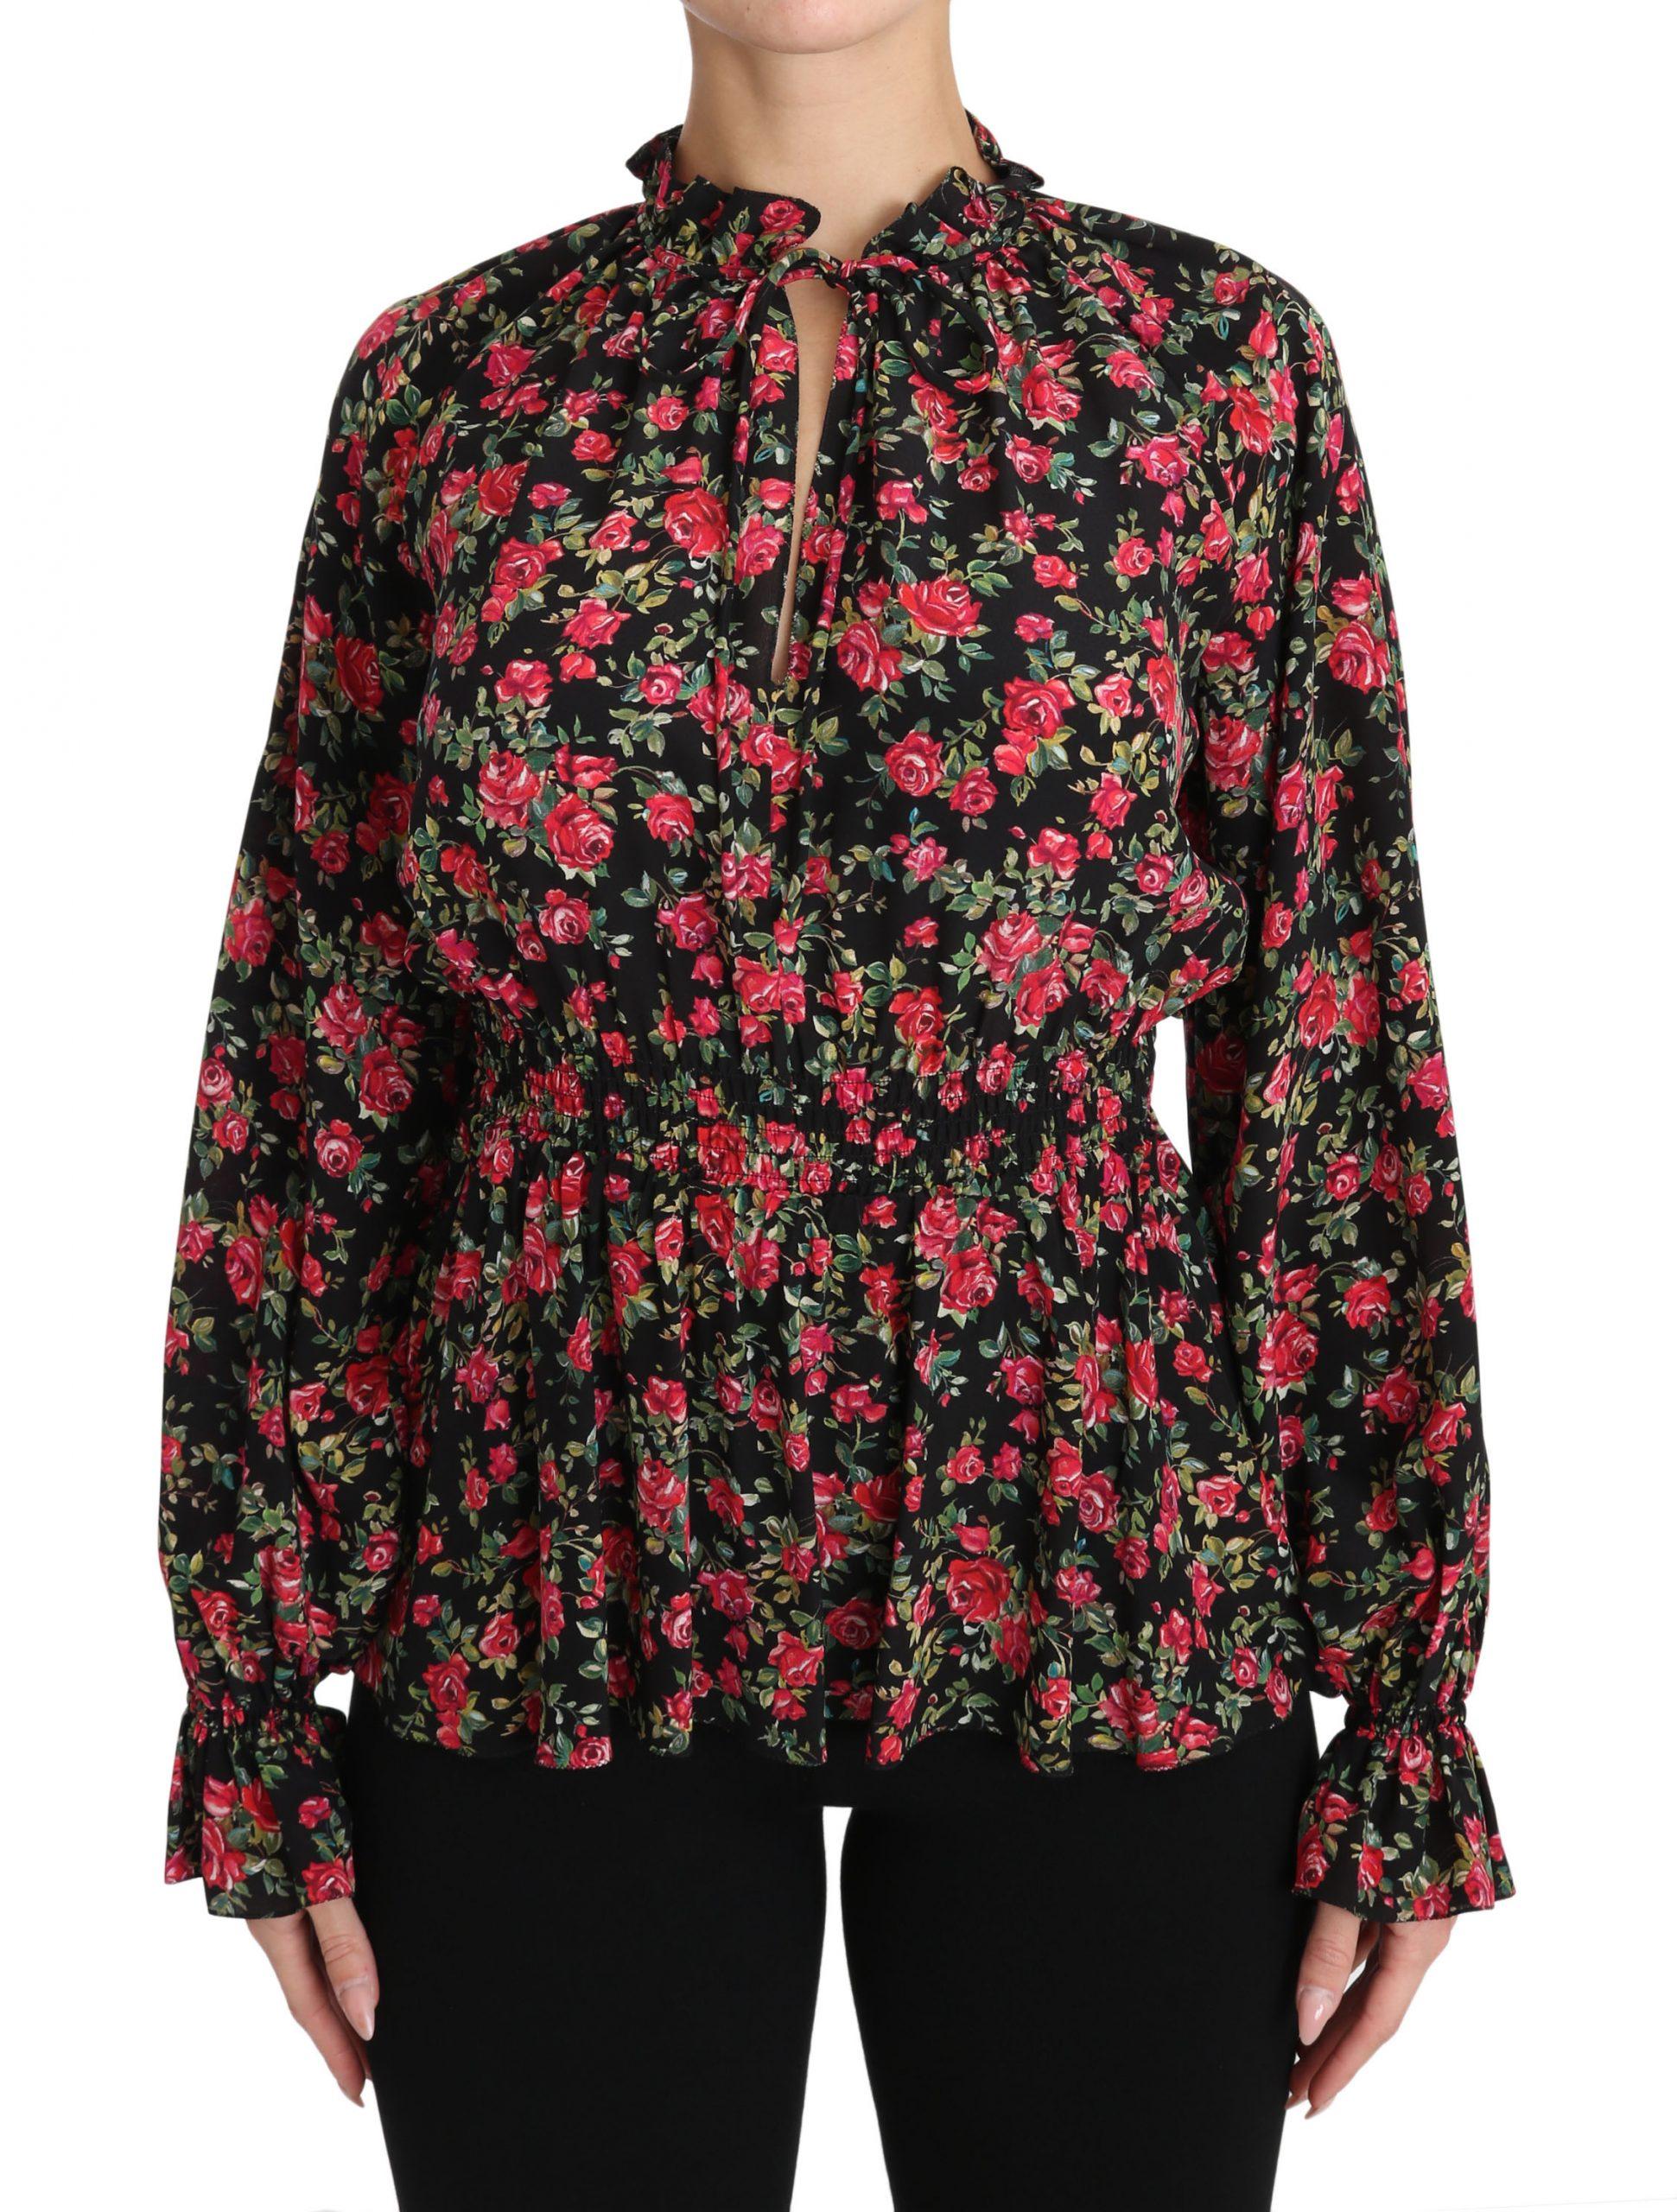 Dolce & Gabbana Women's Floral Elasticated Shirts Black TSH3131 - IT36 XXS